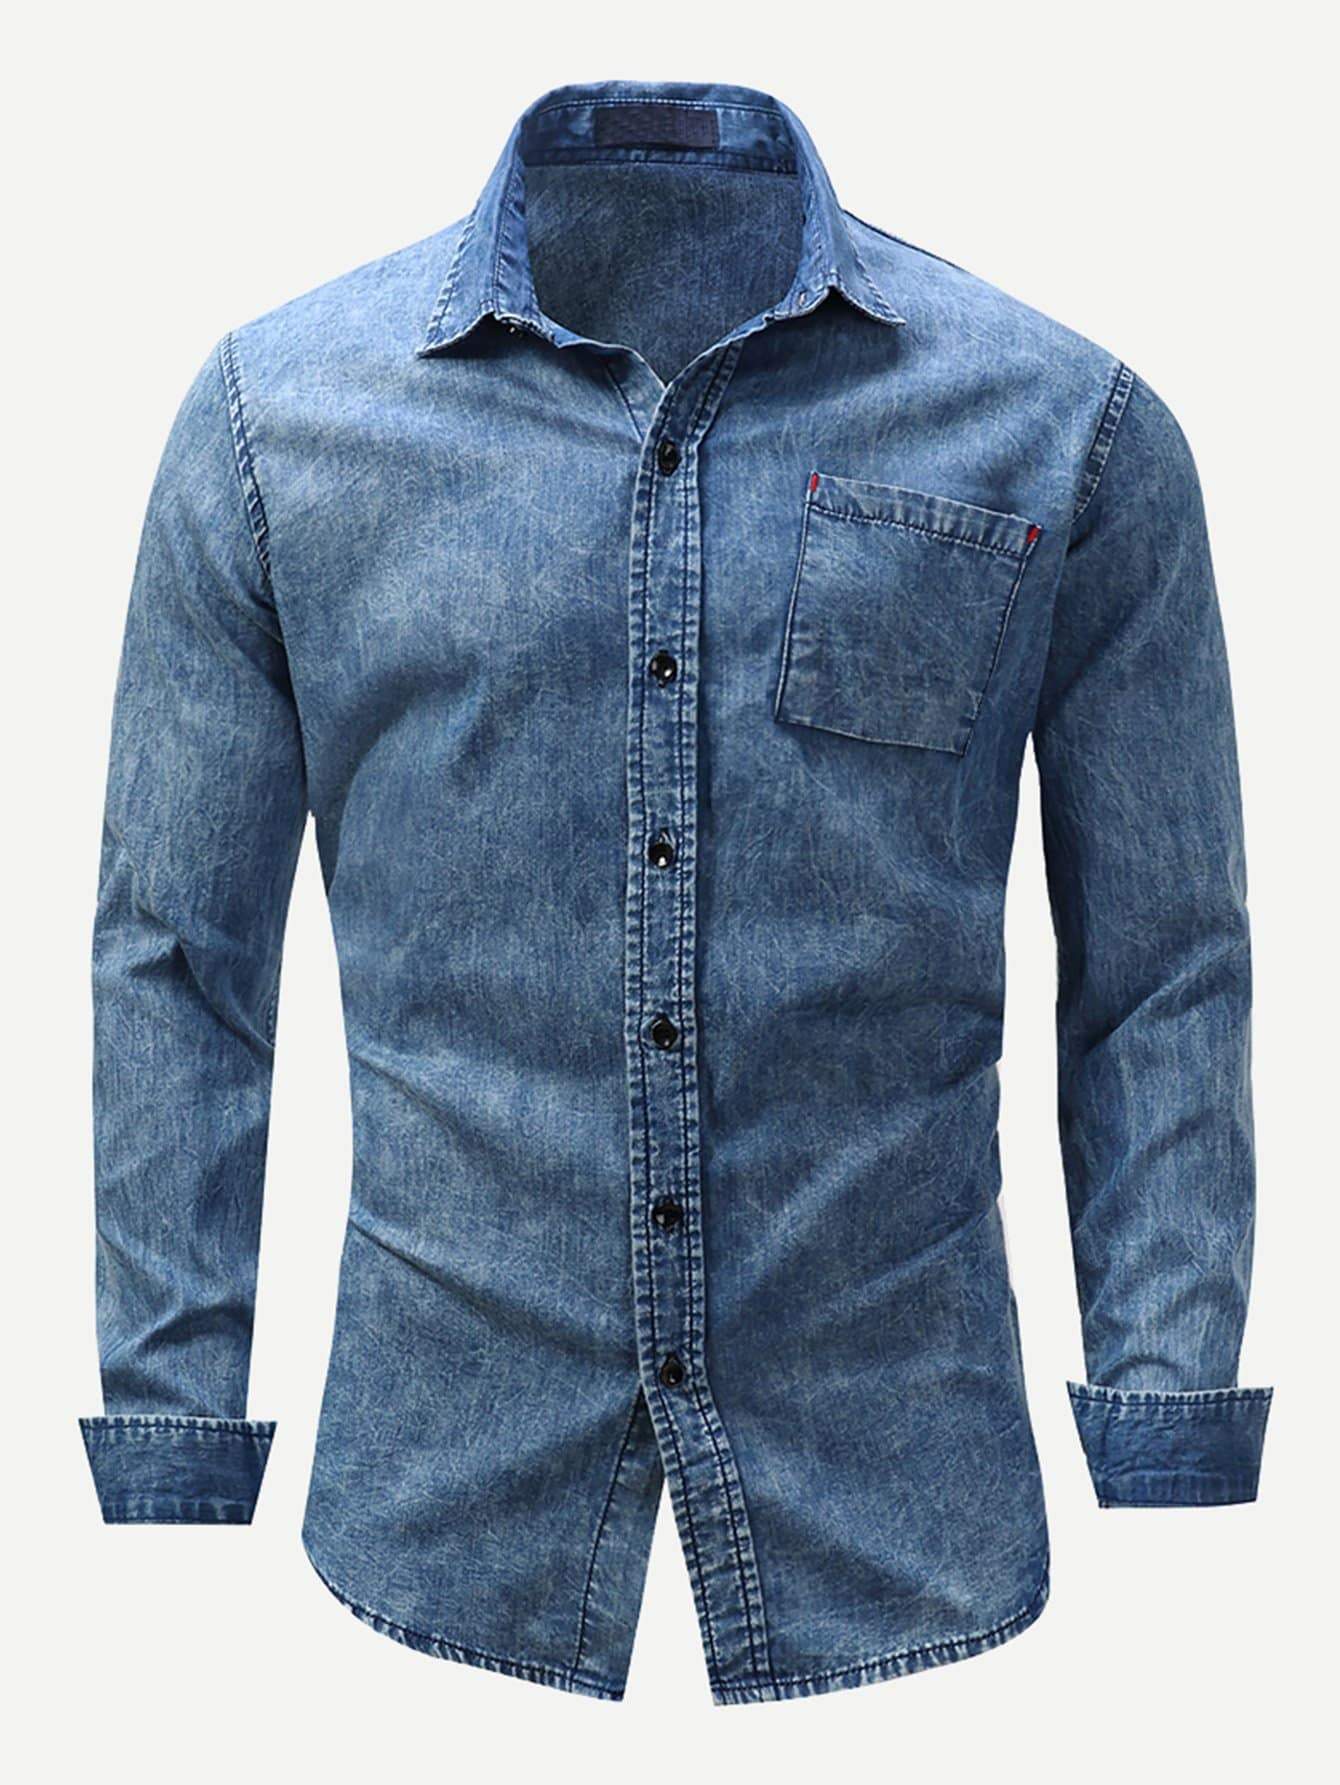 Men Washed Denim Shirt Men Washed Denim Shirt